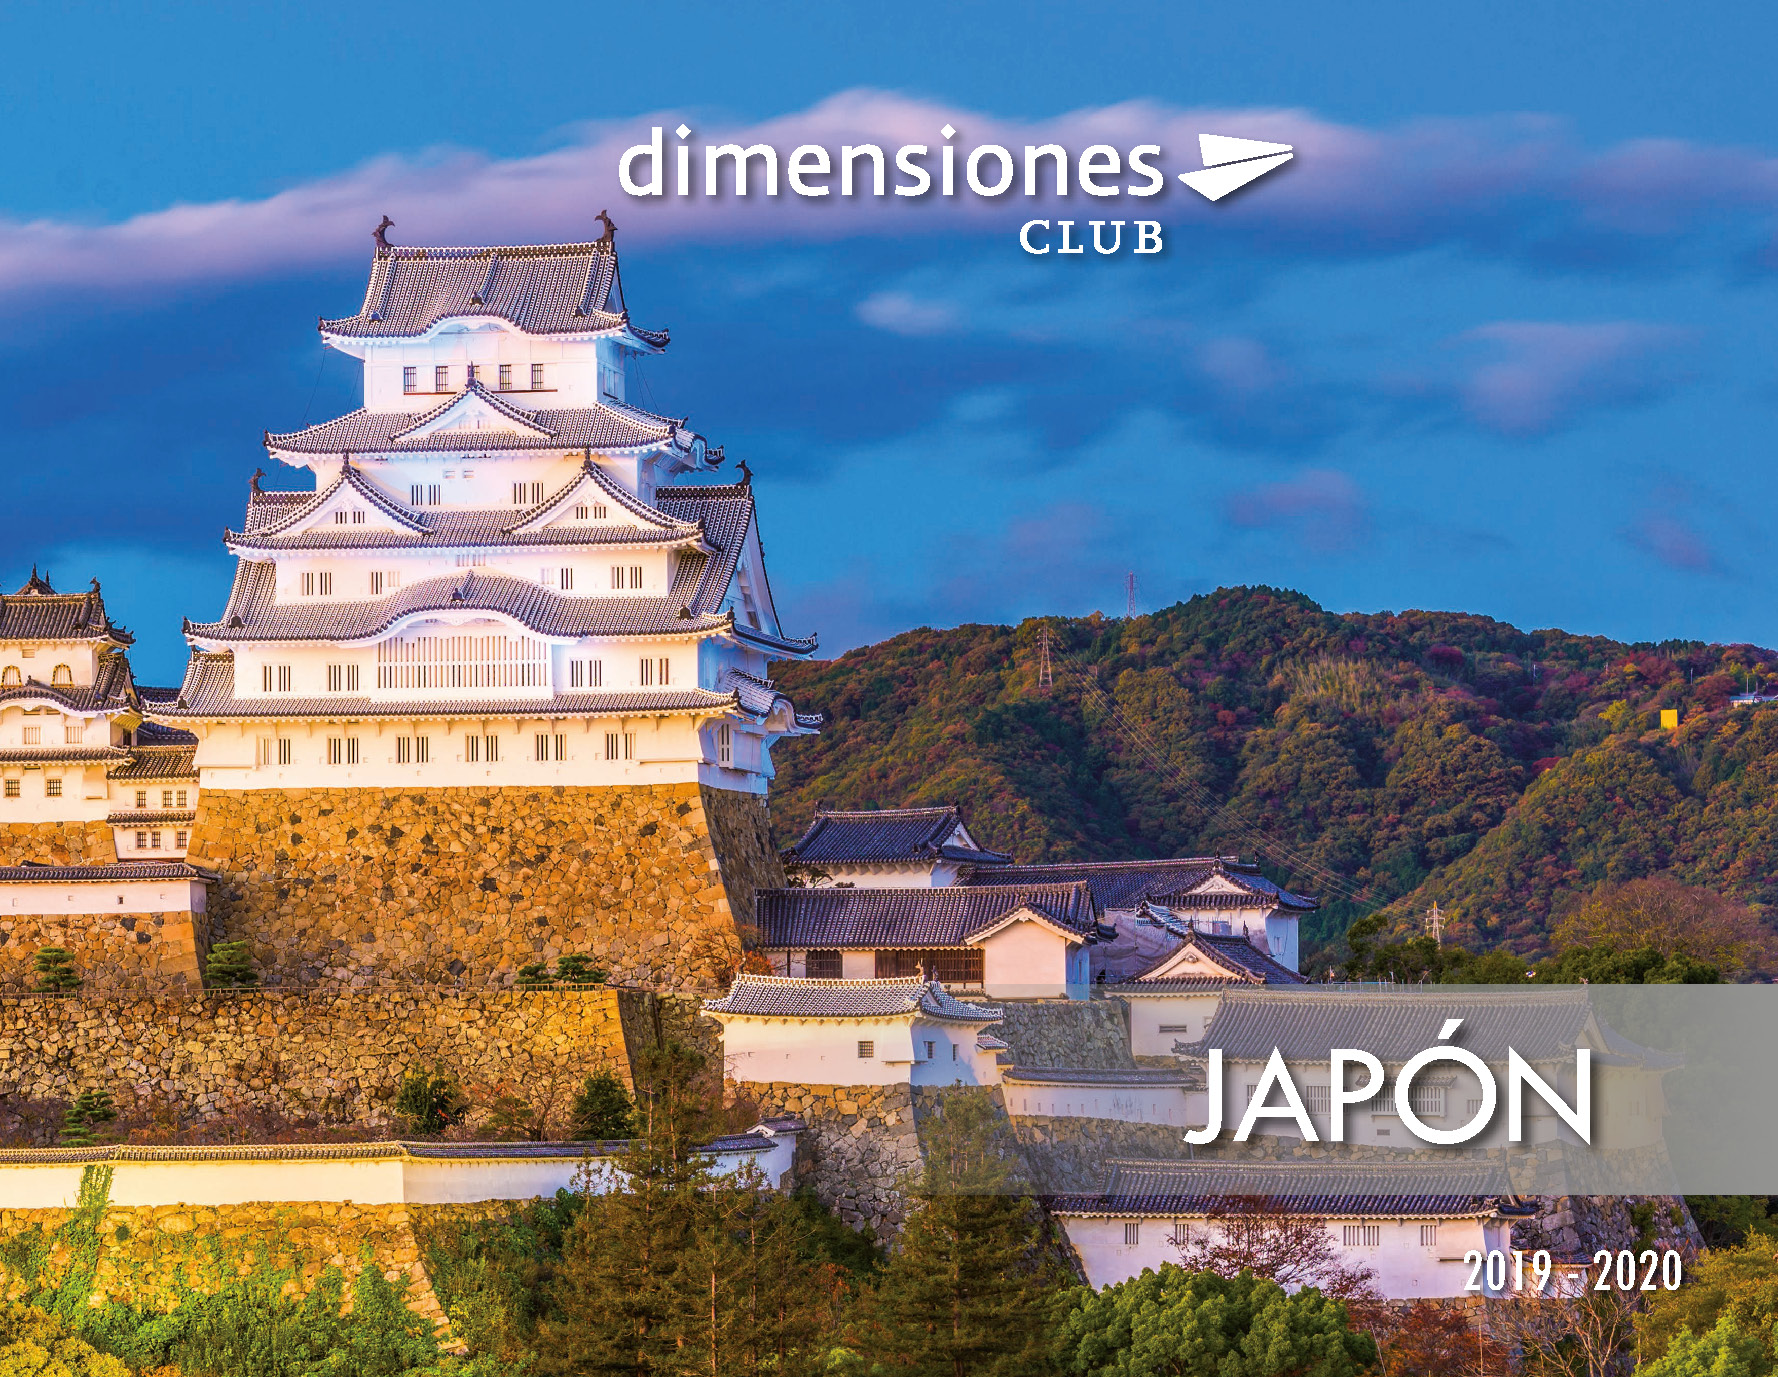 Catalogo Dimensiones Club Japon 2019